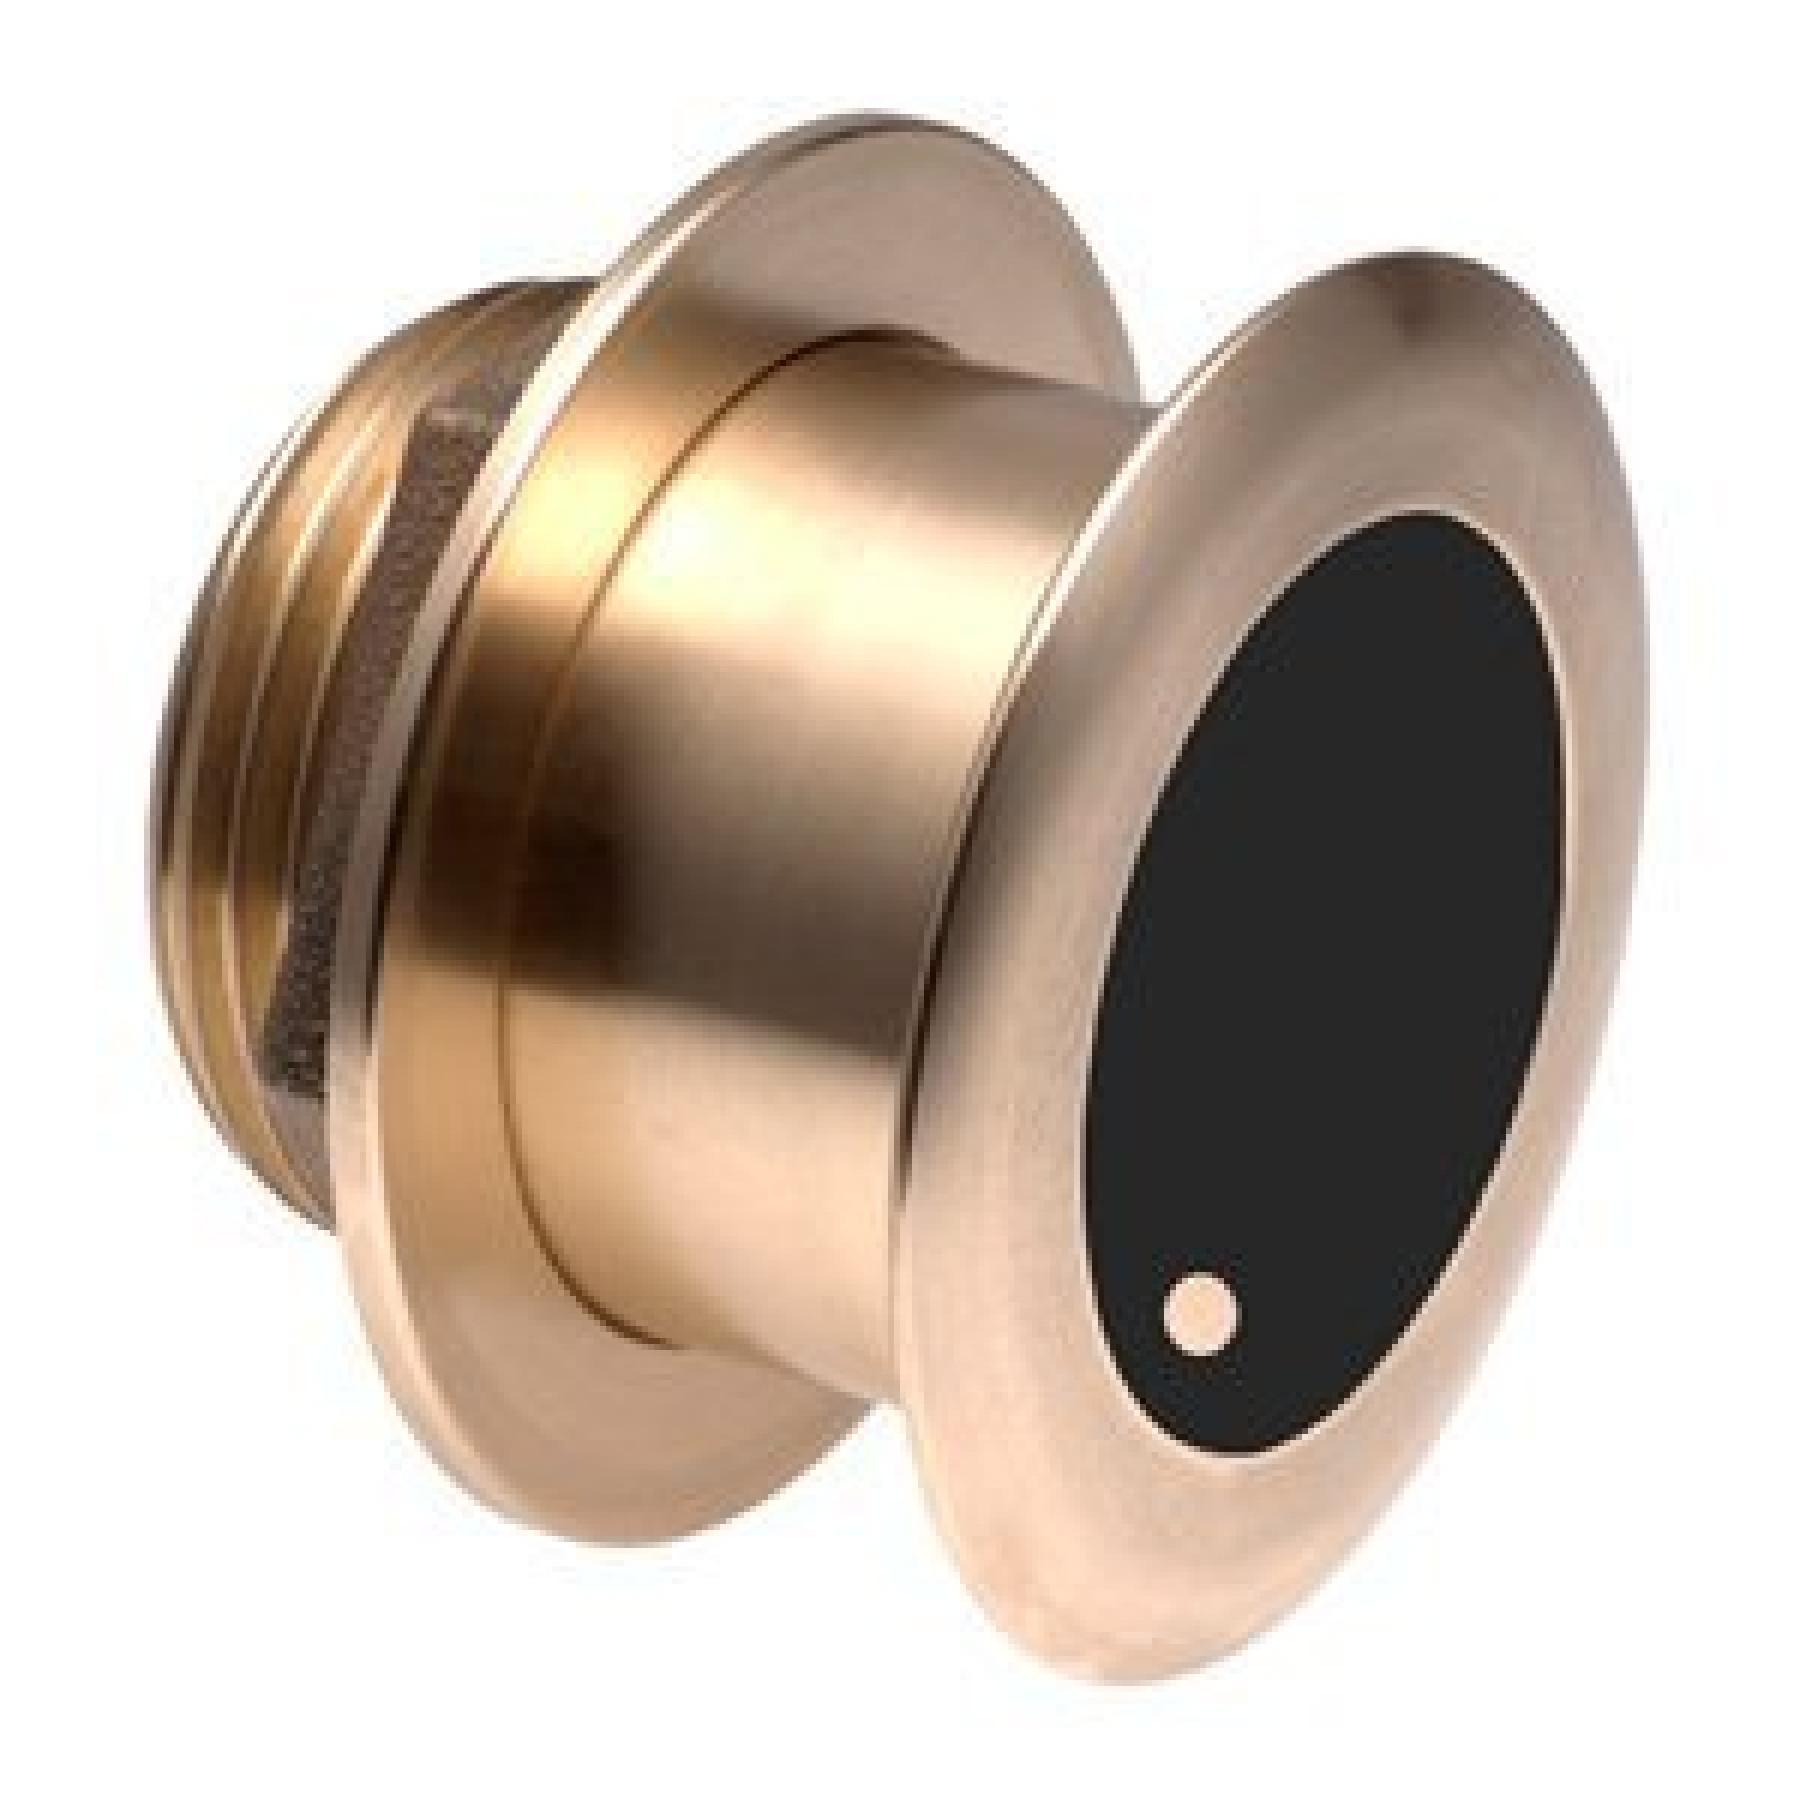 Garmin airmar b175h sensor 12° inclined element